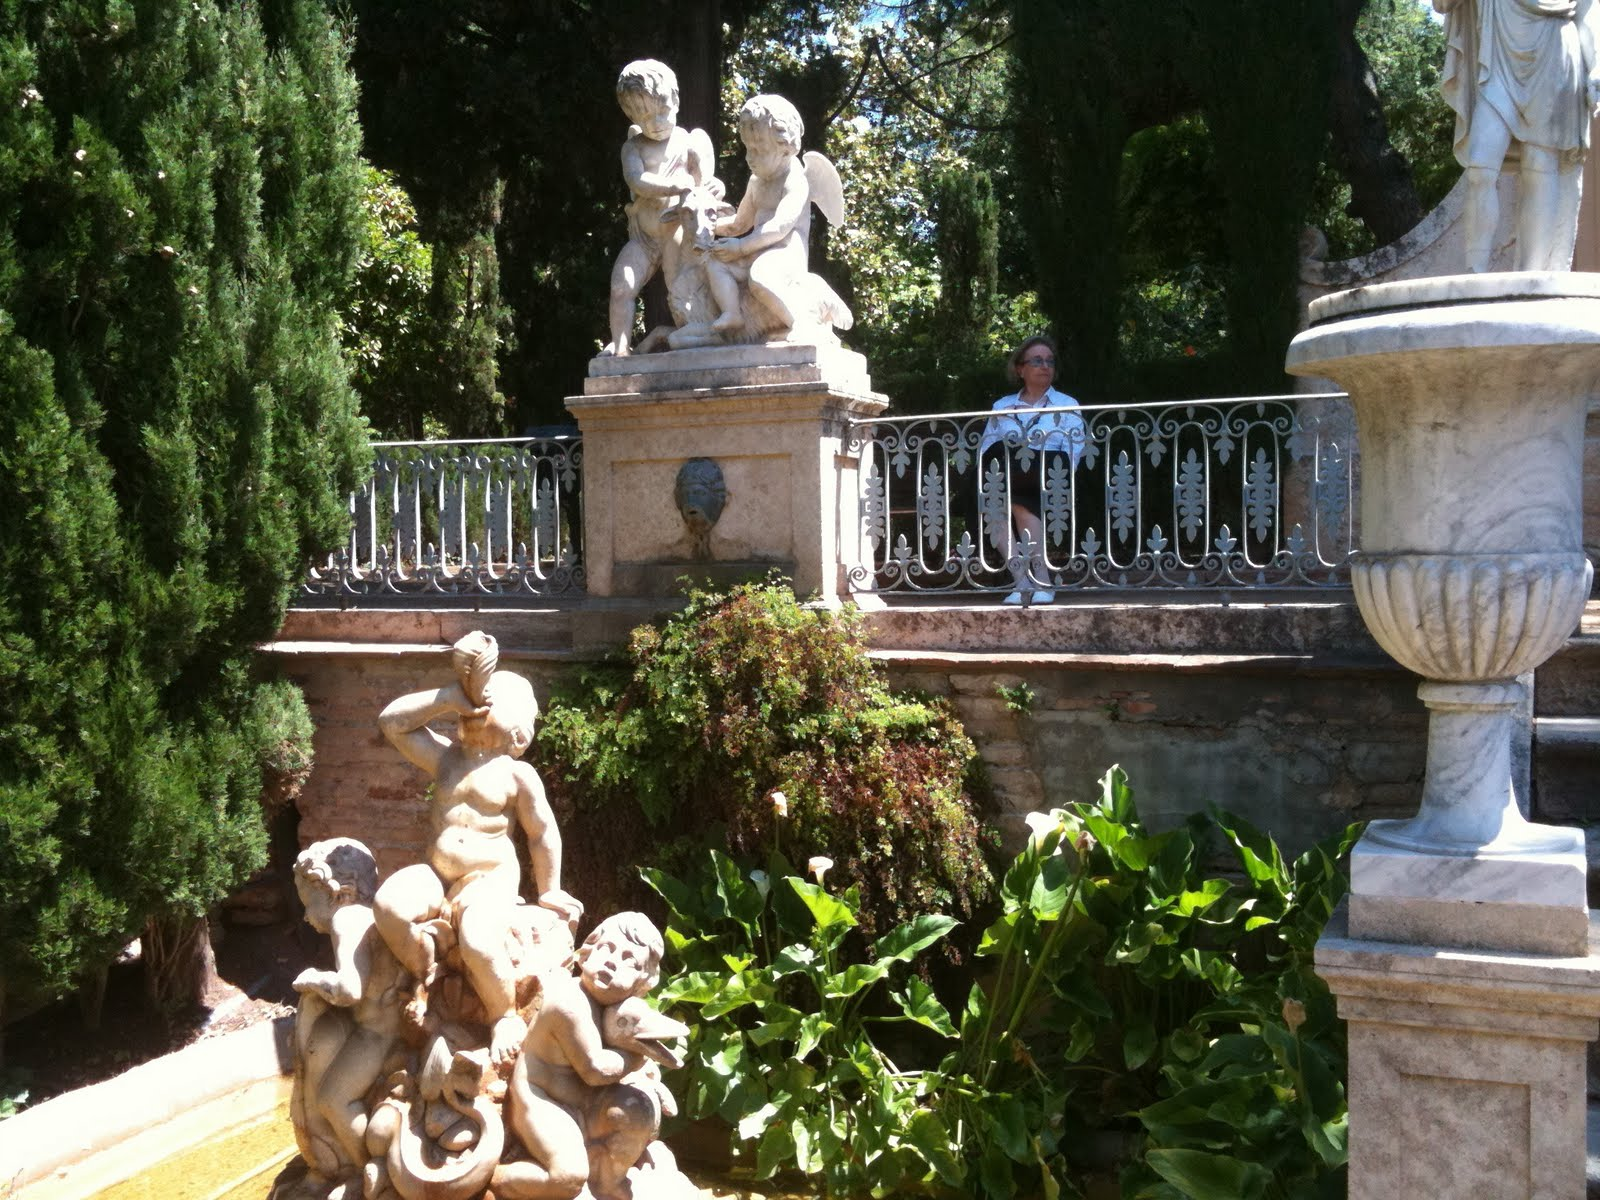 Jardines de monforte fotos vhs for Jardines de monforte